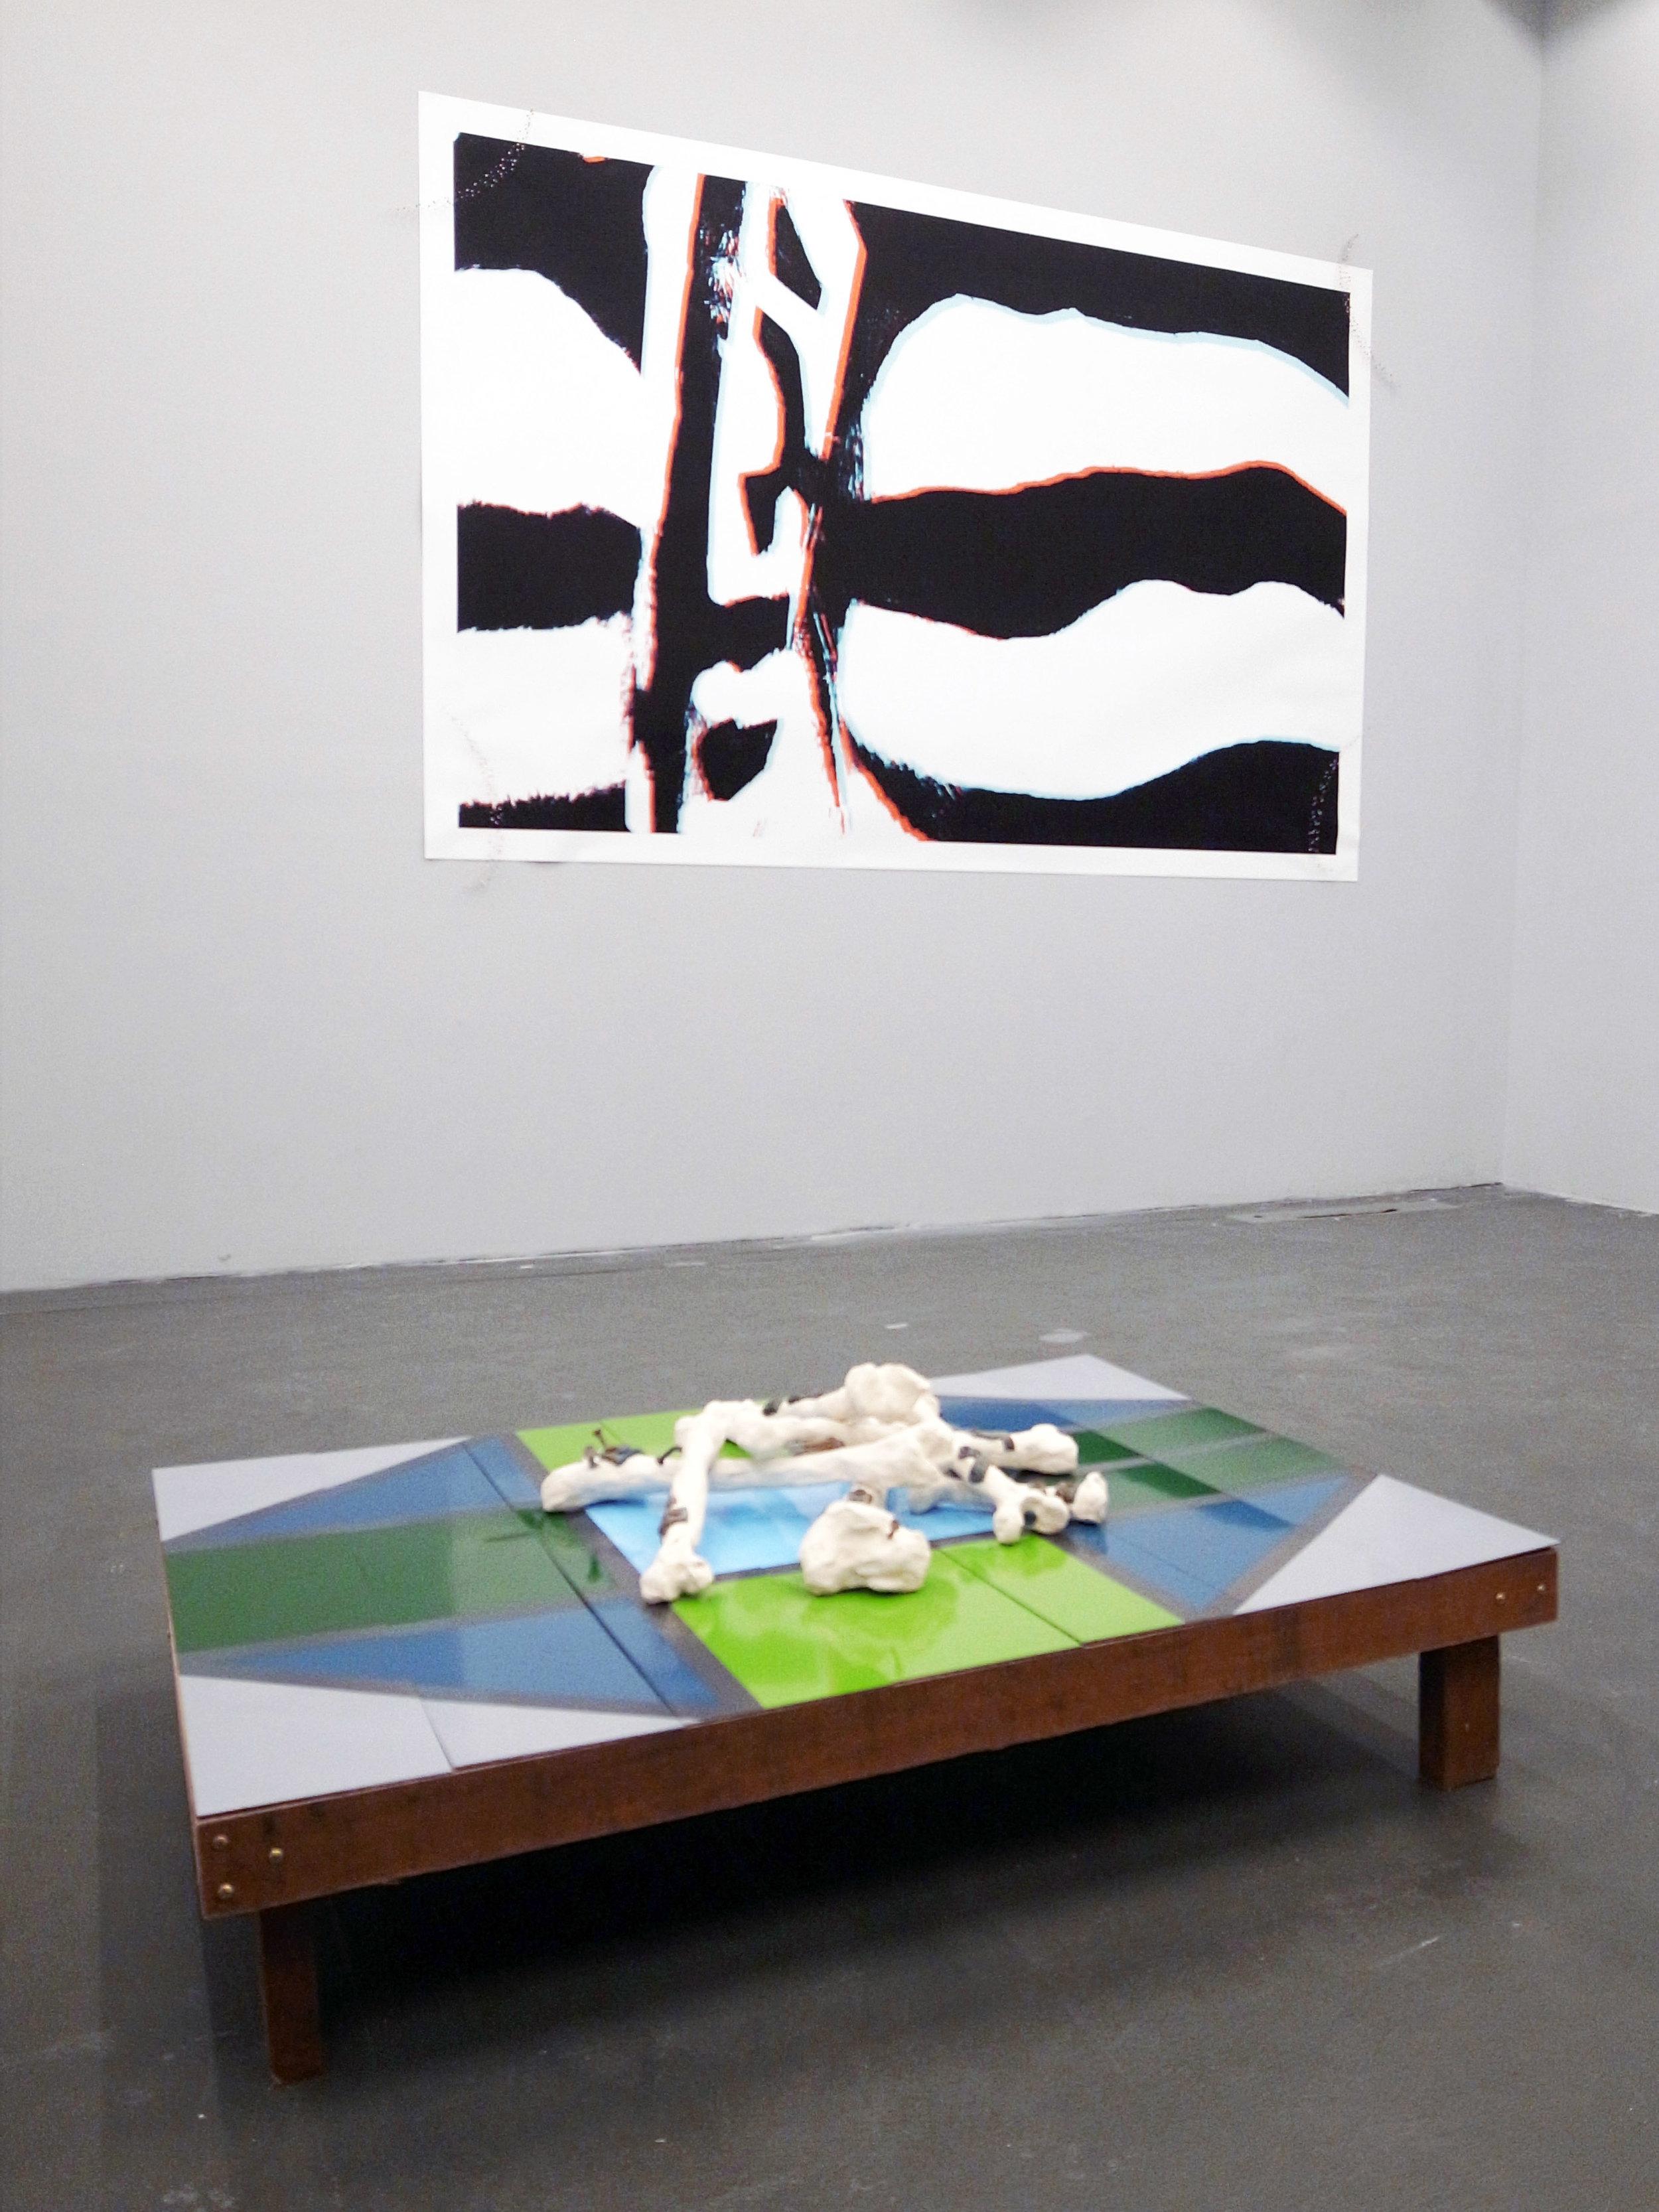 Installation shot of artist Matti Isan Blind's artwork.